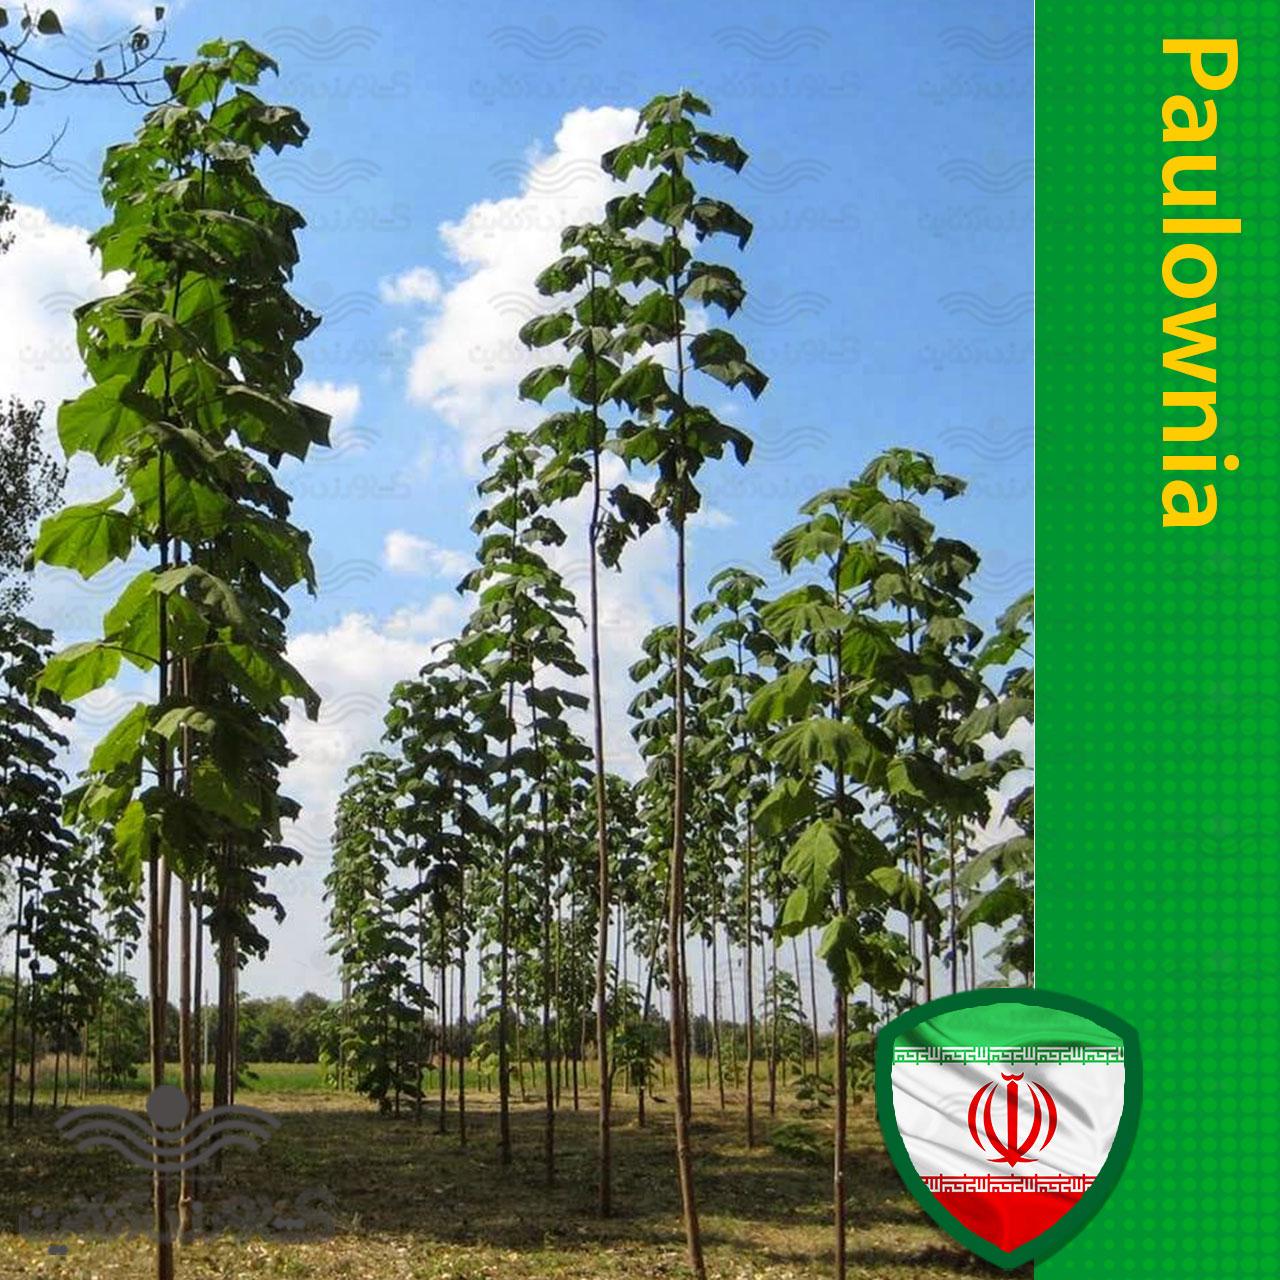 بذر پالونیا فورتنی 2 گرمی